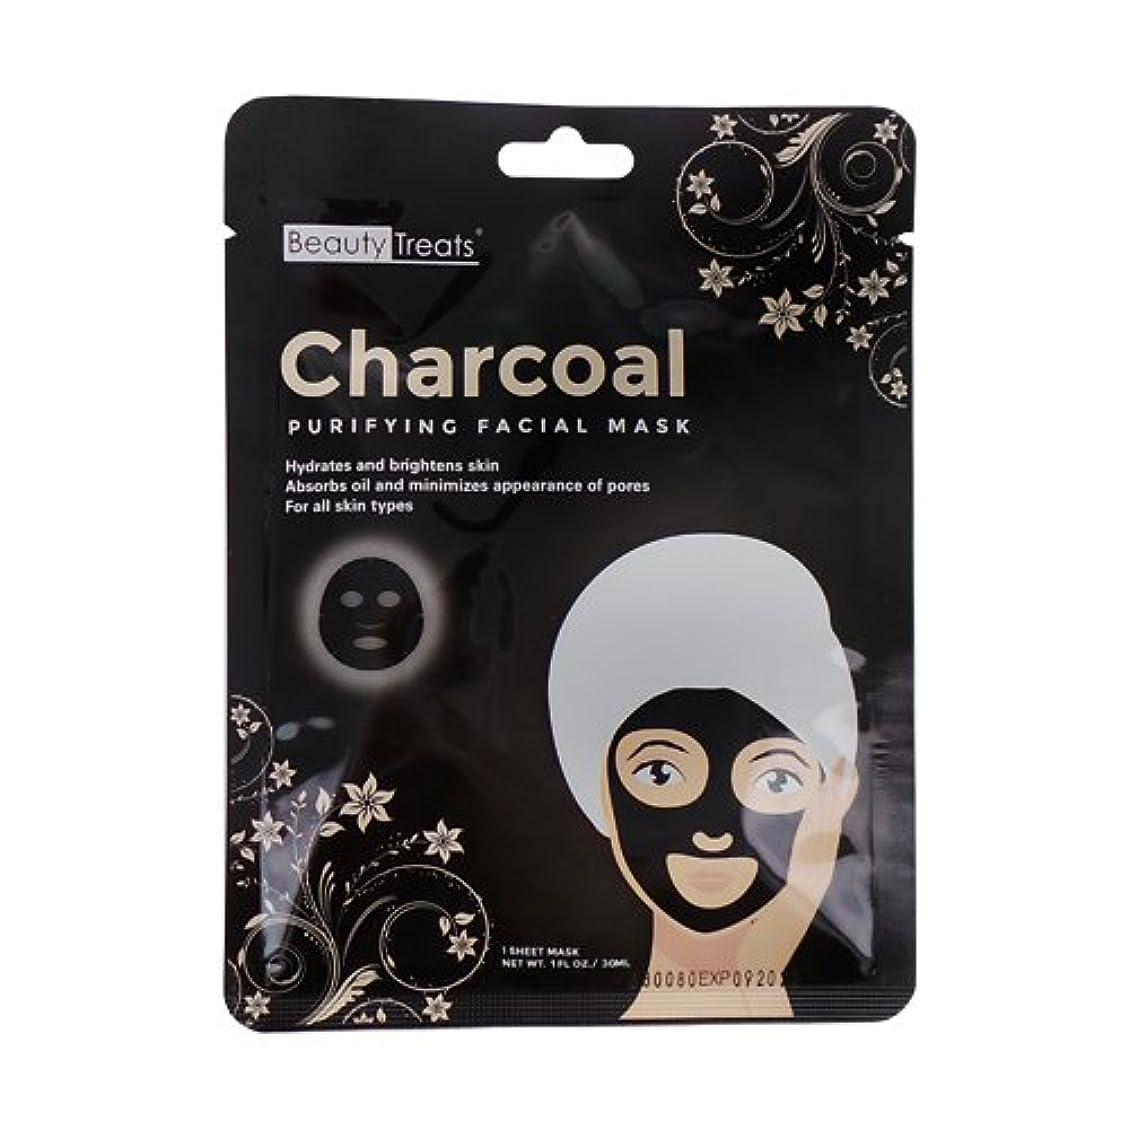 (6 Pack) BEAUTY TREATS Charcoal Purifying Facial Mask (並行輸入品)